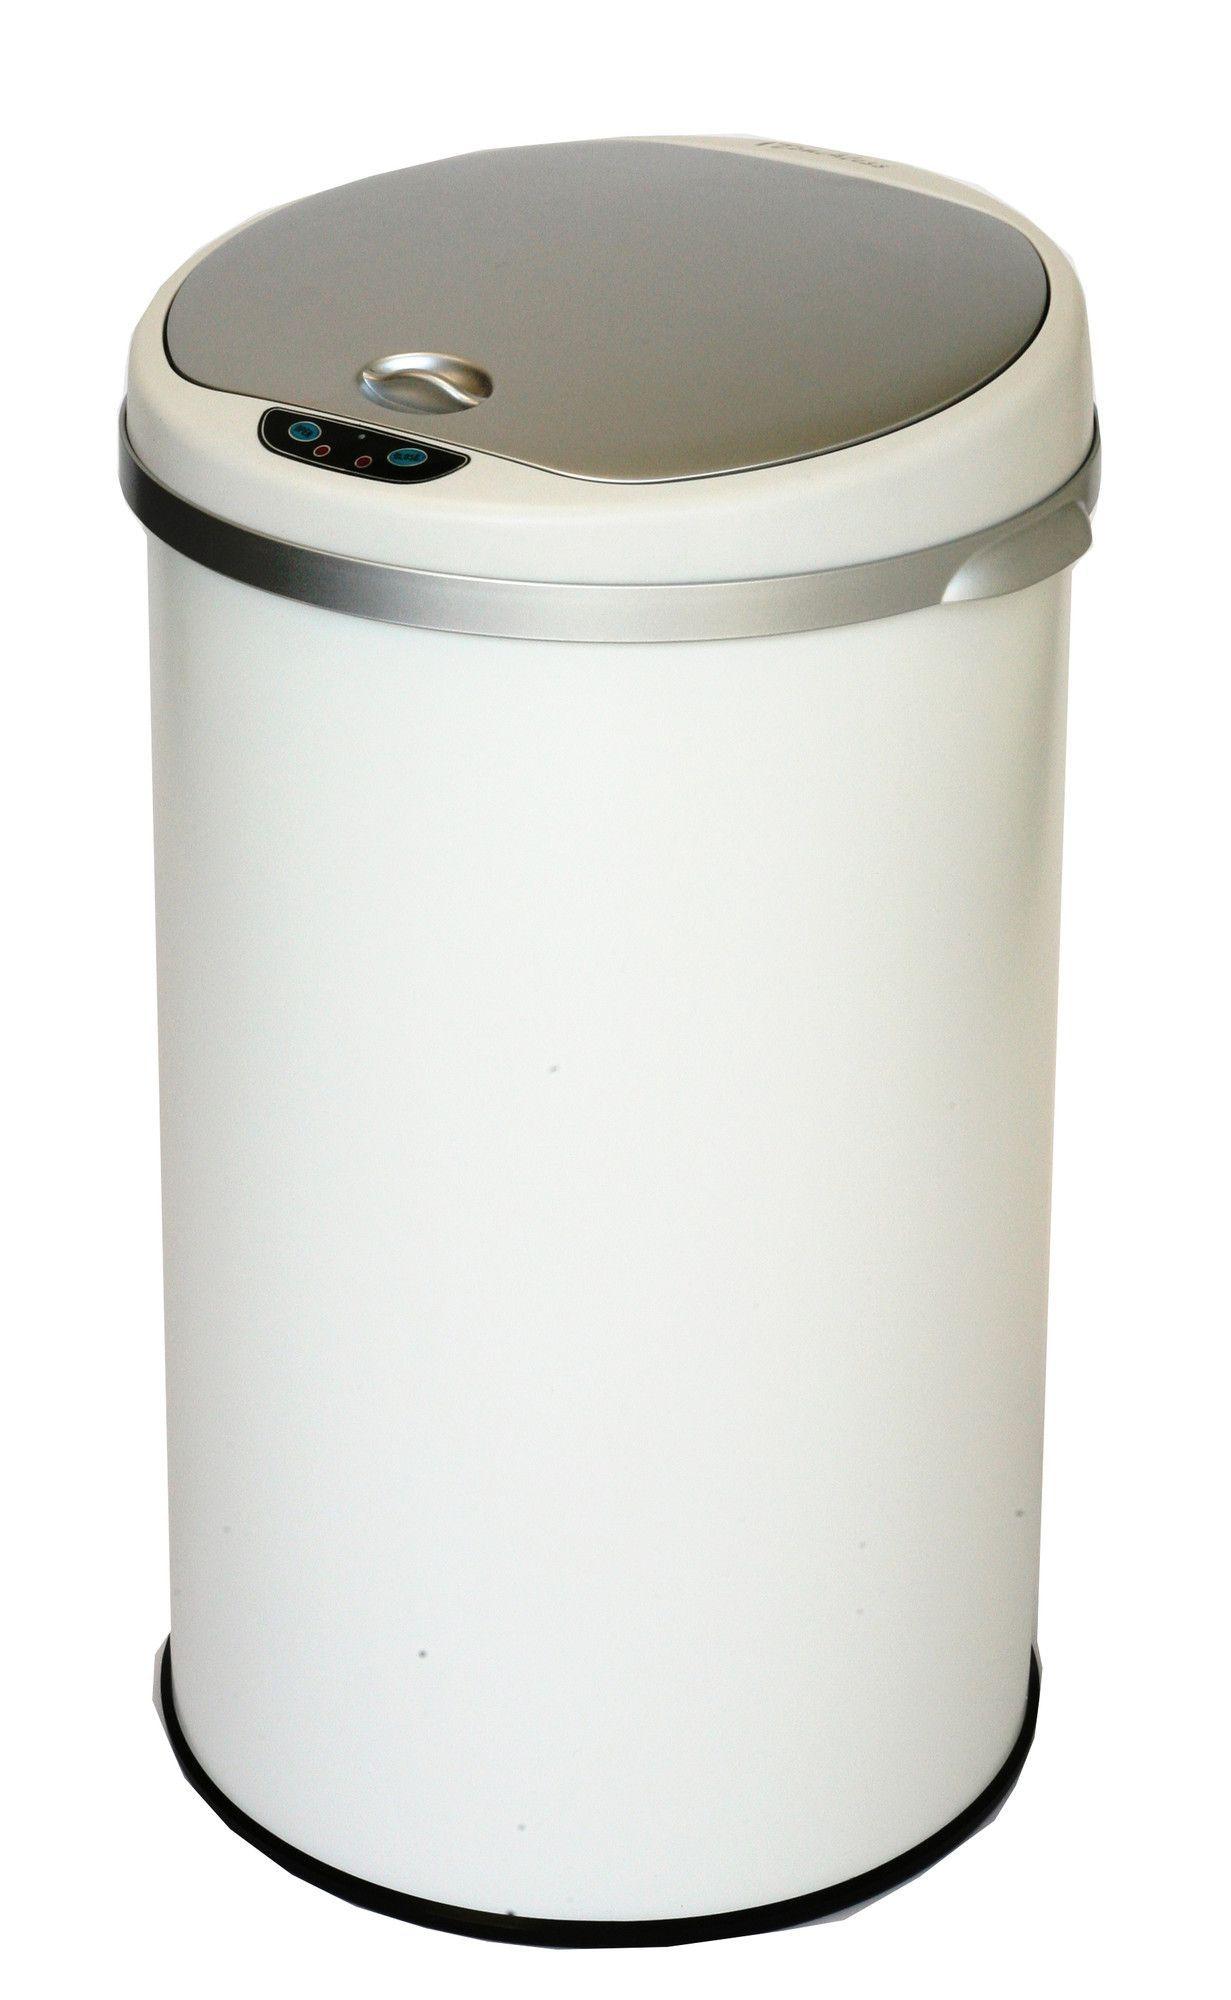 Deodorizer Round Sensor Trash Can